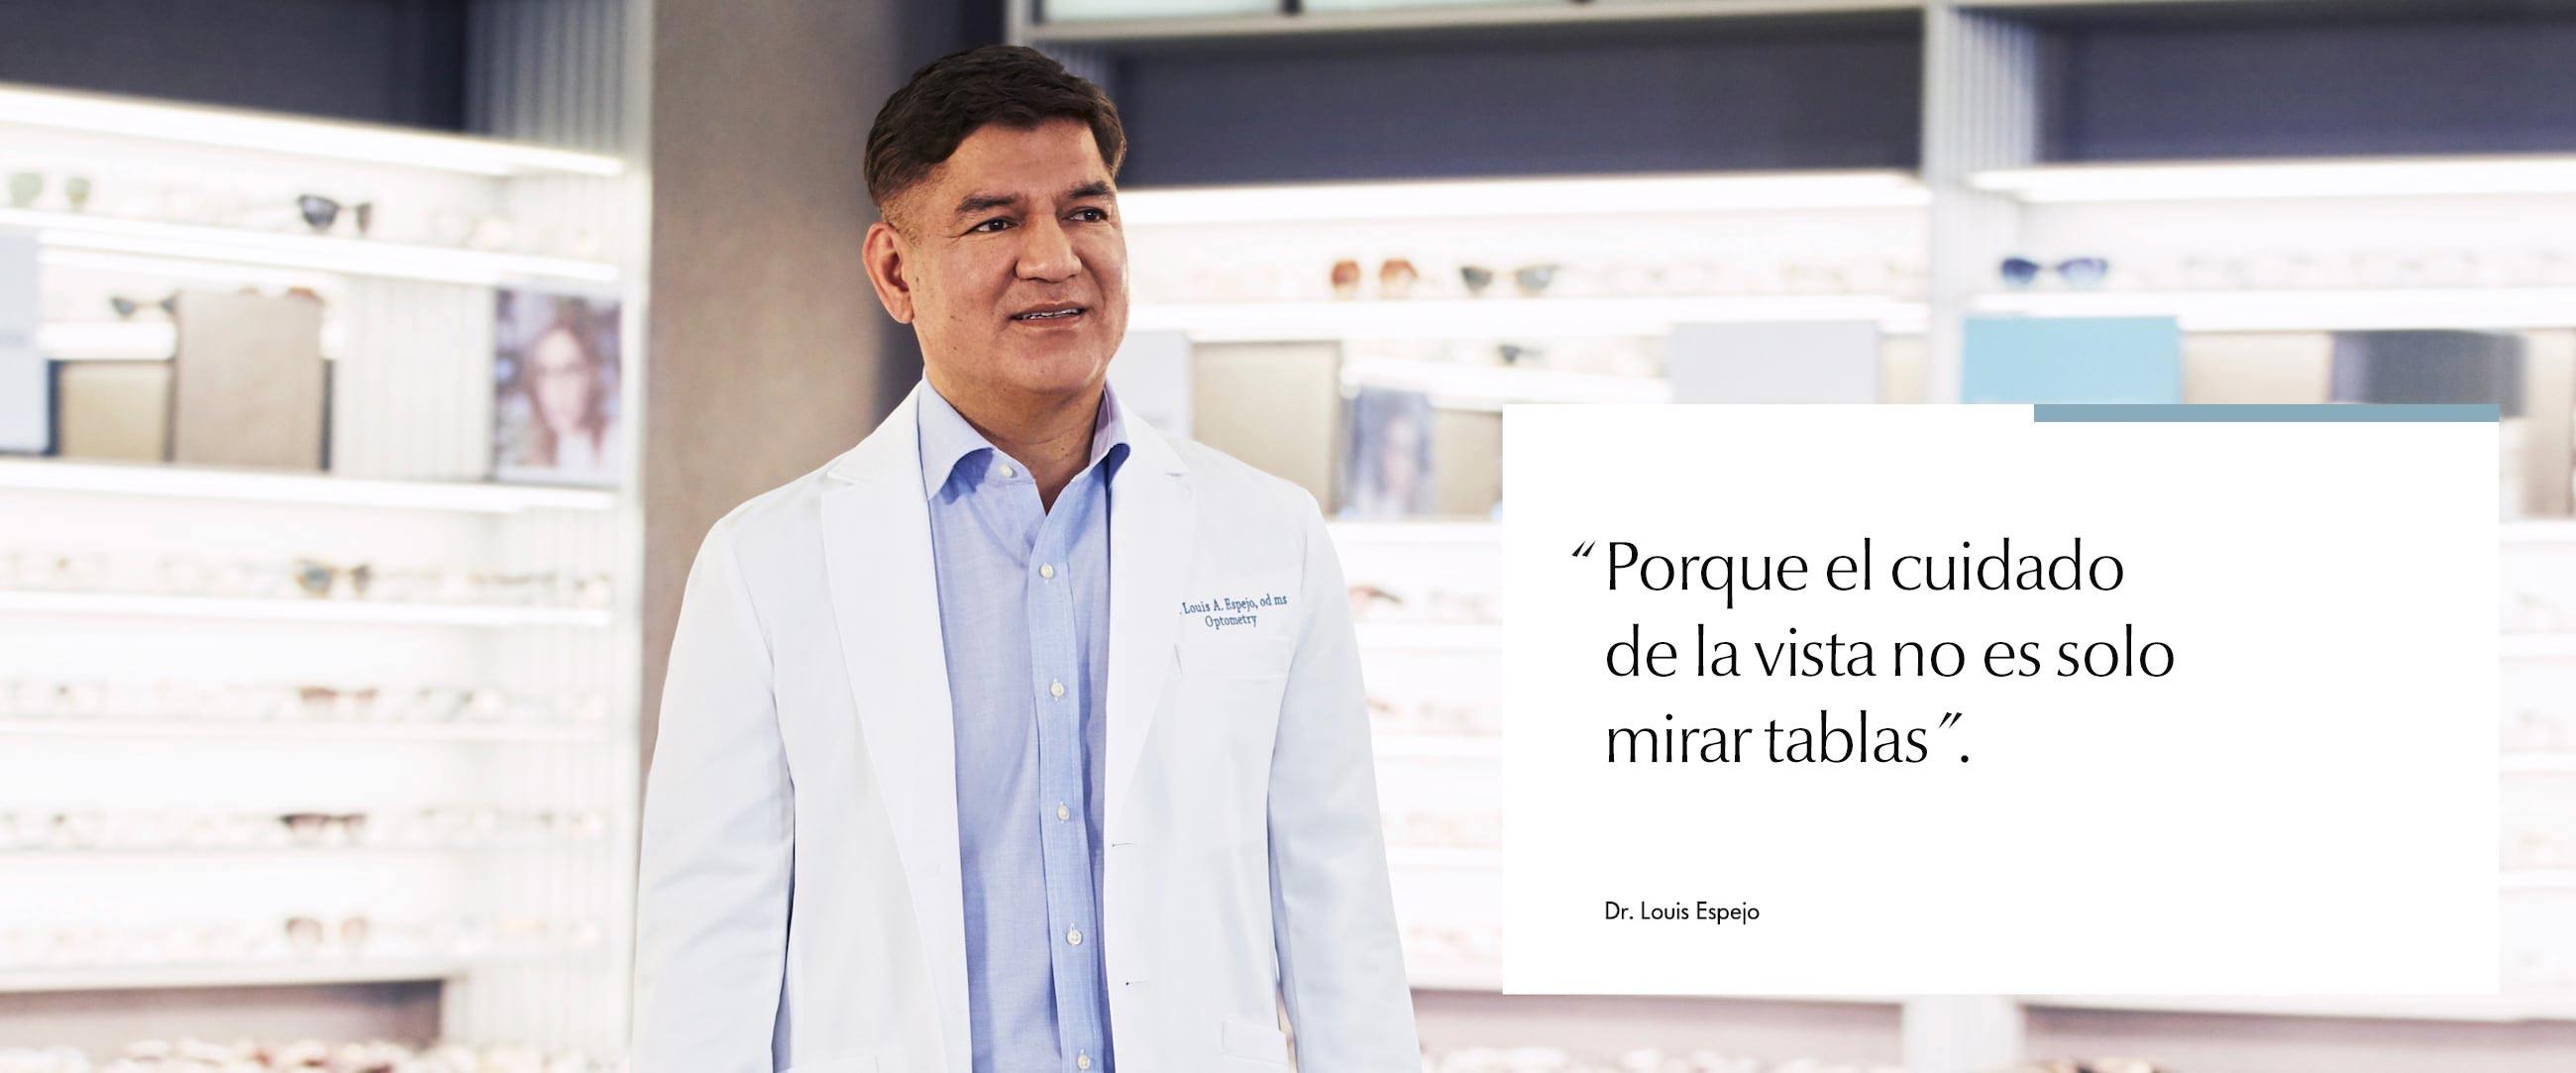 Imagen del doctor Espejo